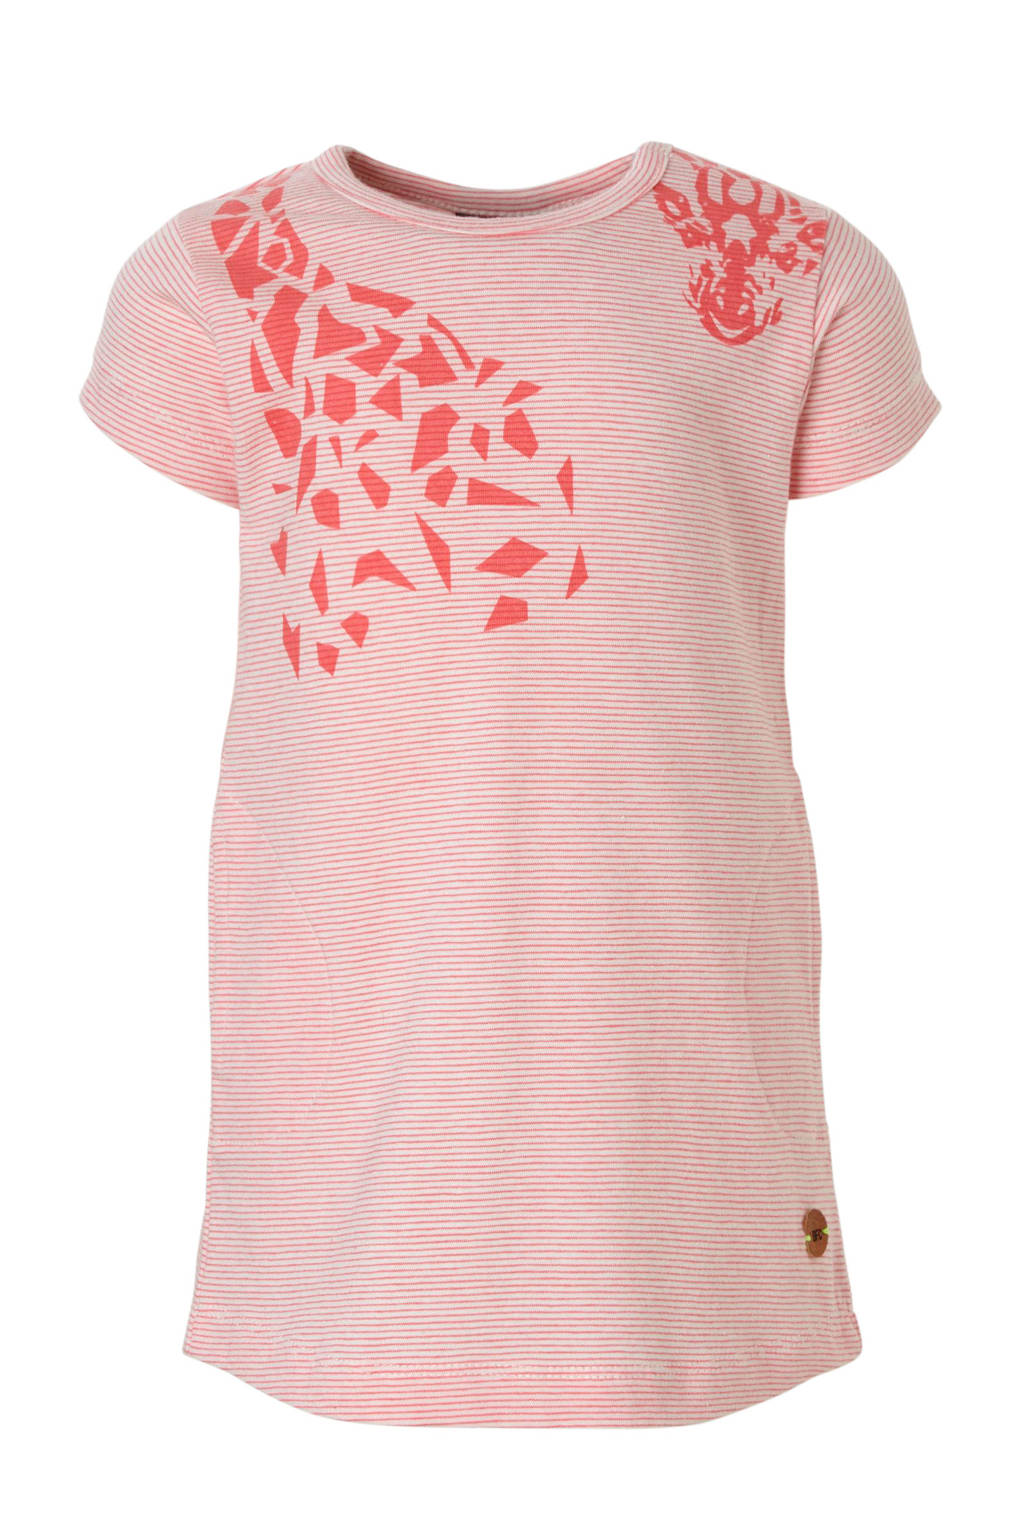 Babyface gestreepte jurk met giraf roze, Roze